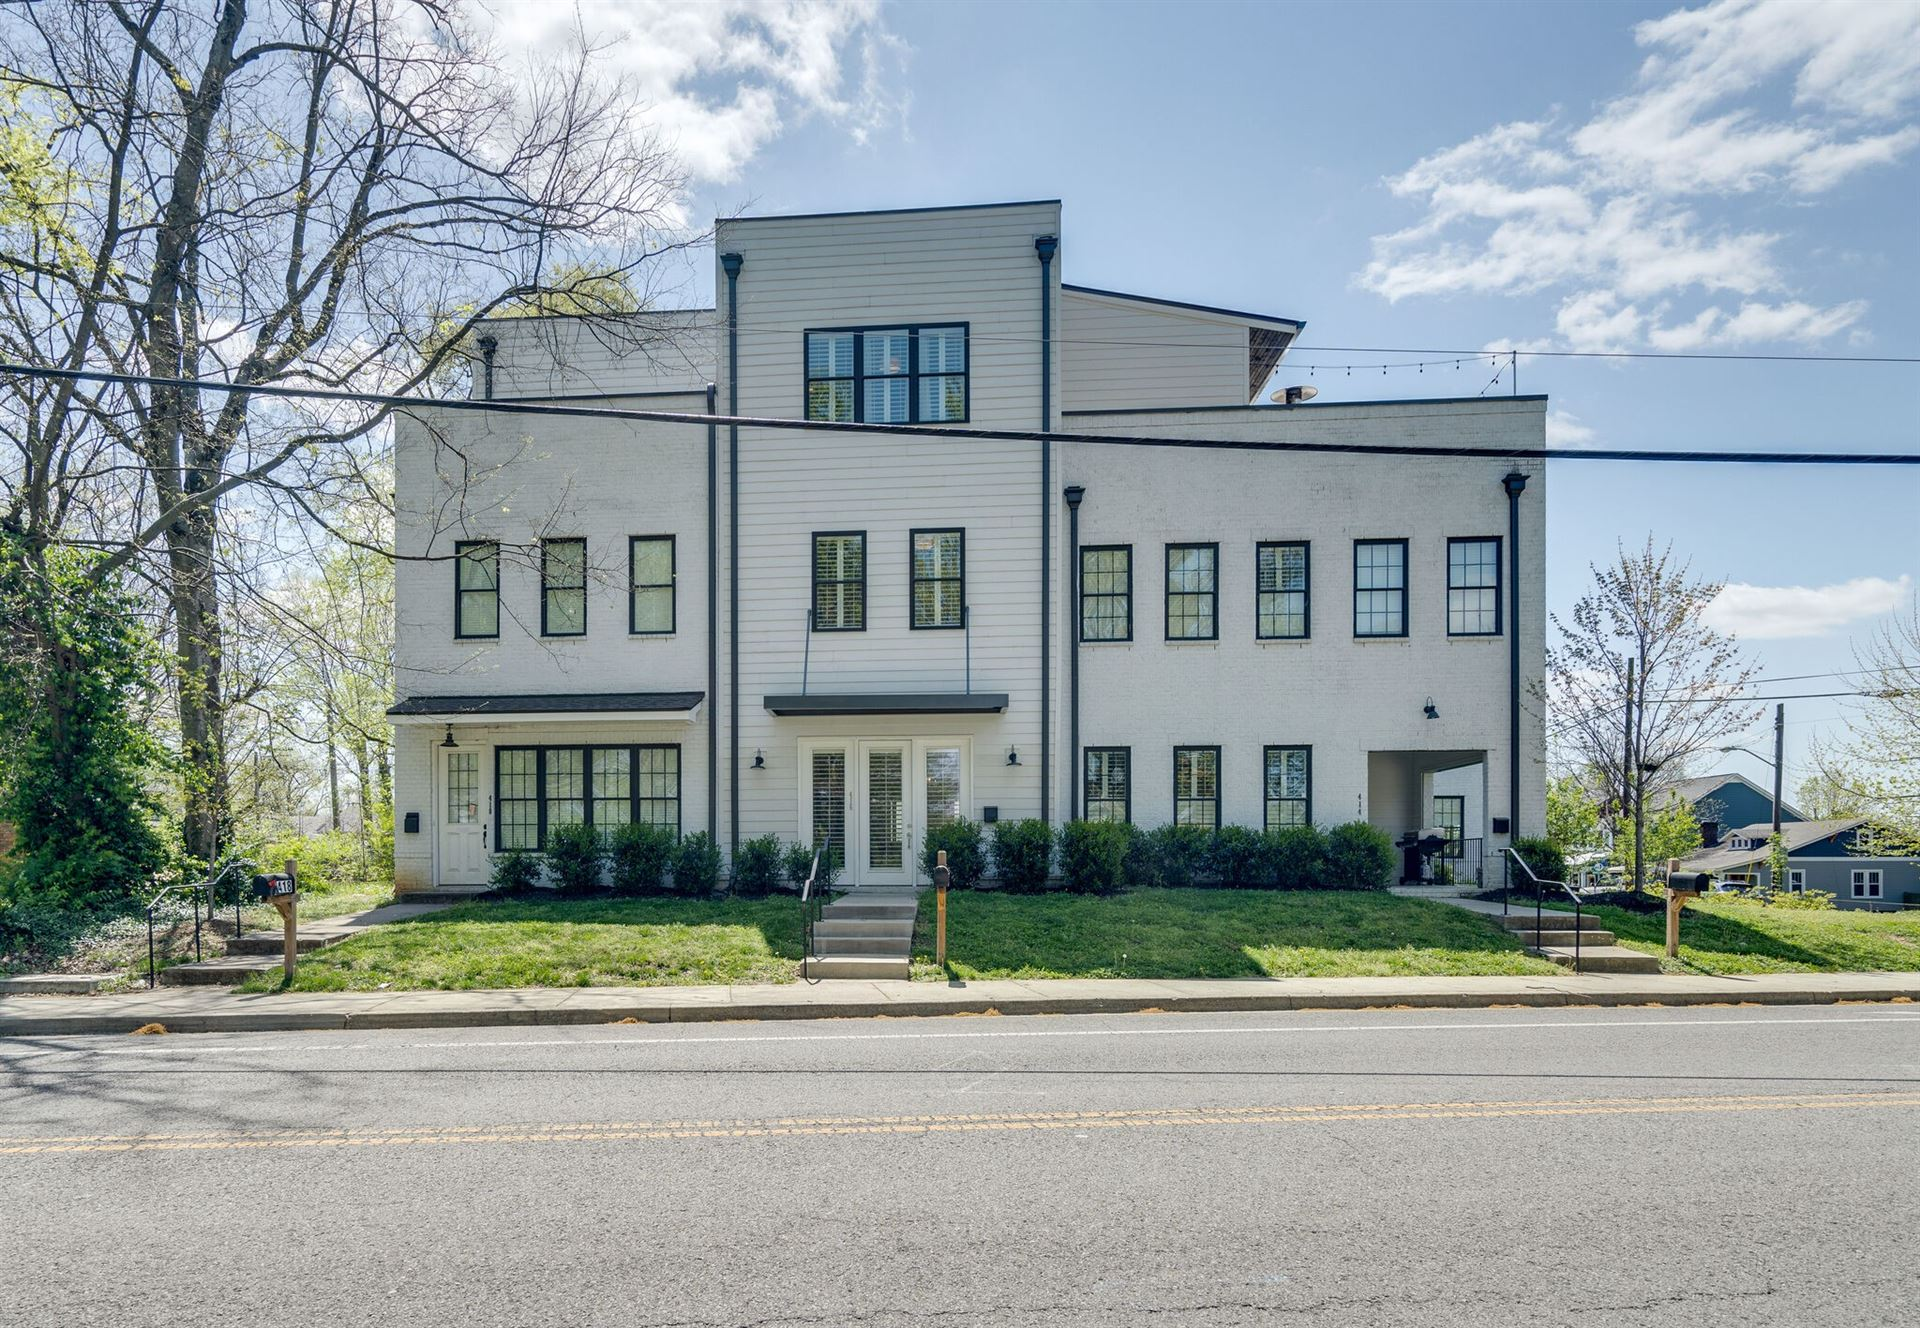 416 Douglas Ave, Nashville, TN 37207 - MLS#: 2246587